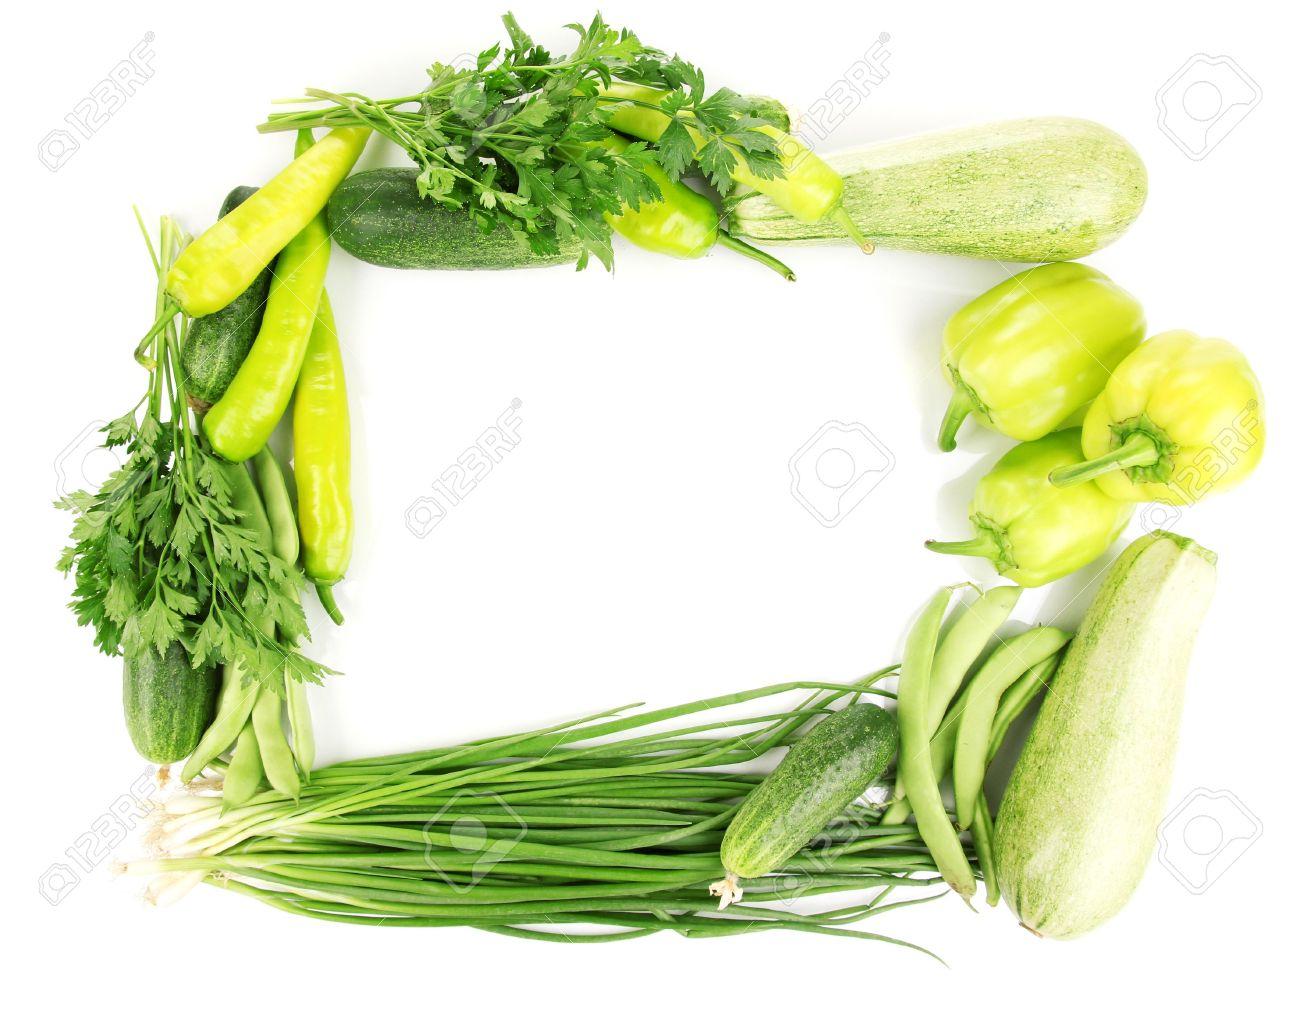 fresh green vegetables isolated on white Stock Photo - 14759531